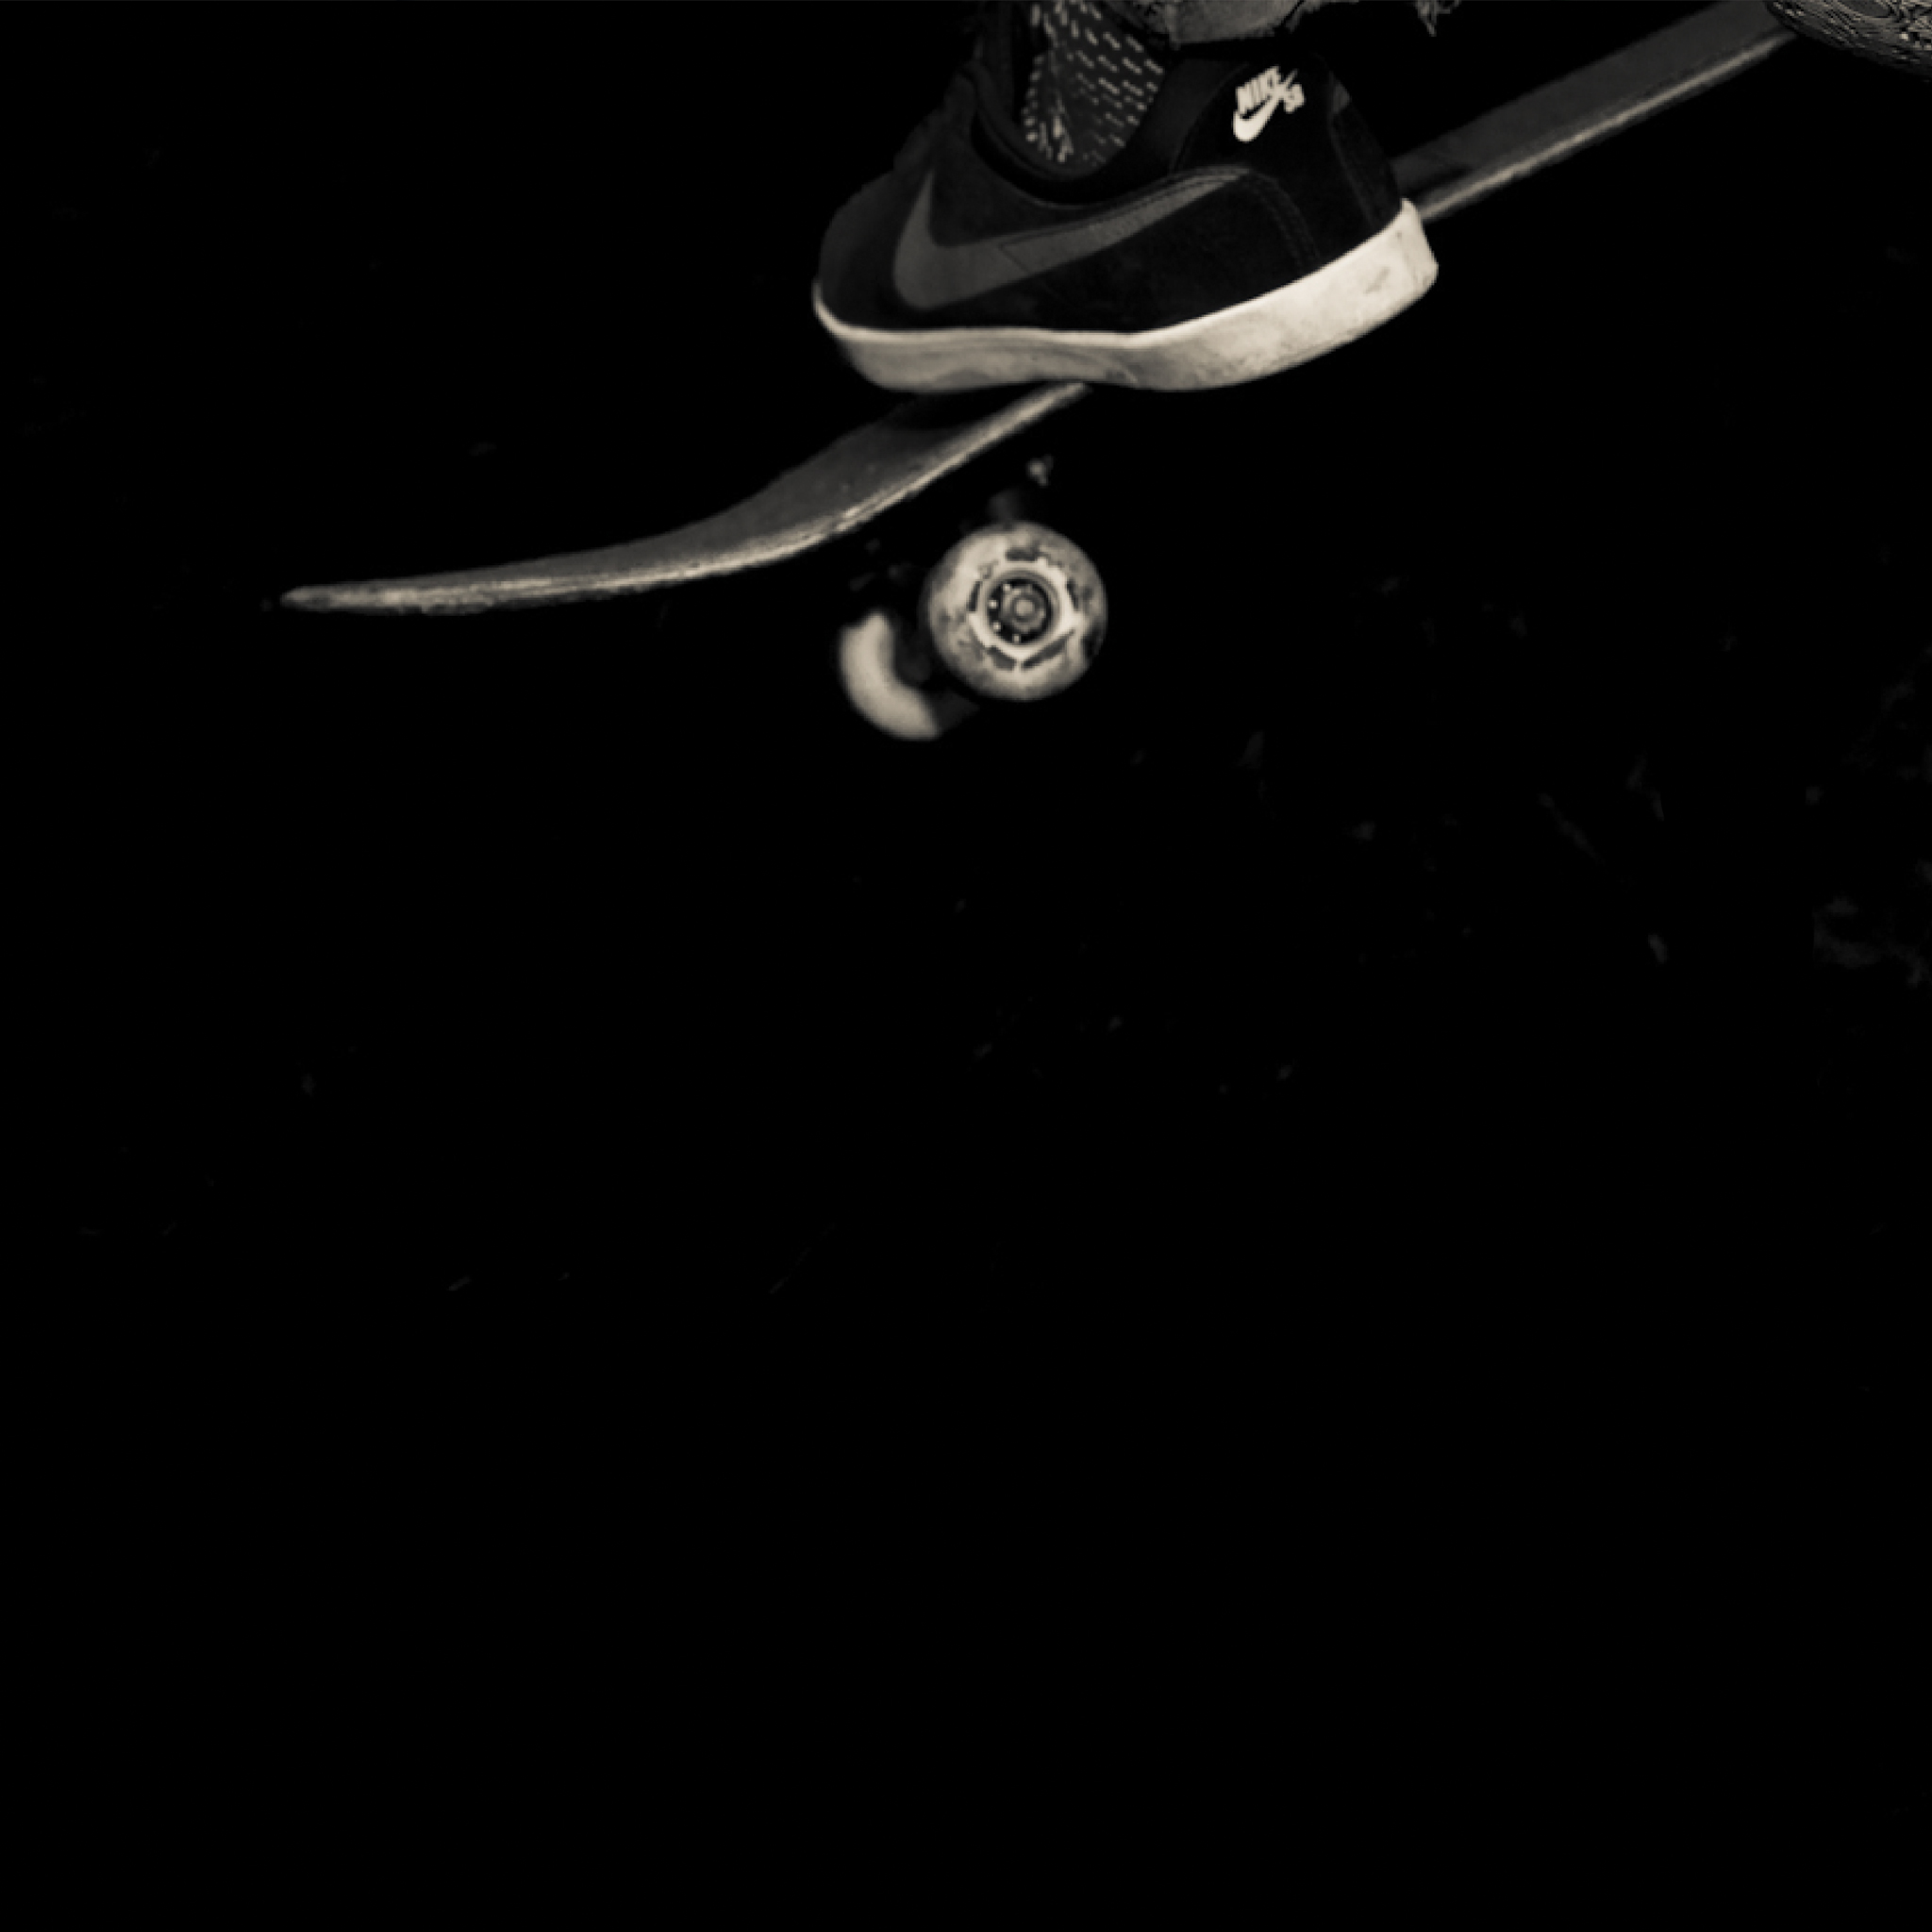 49 Skateboard Iphone Wallpaper On Wallpapersafari